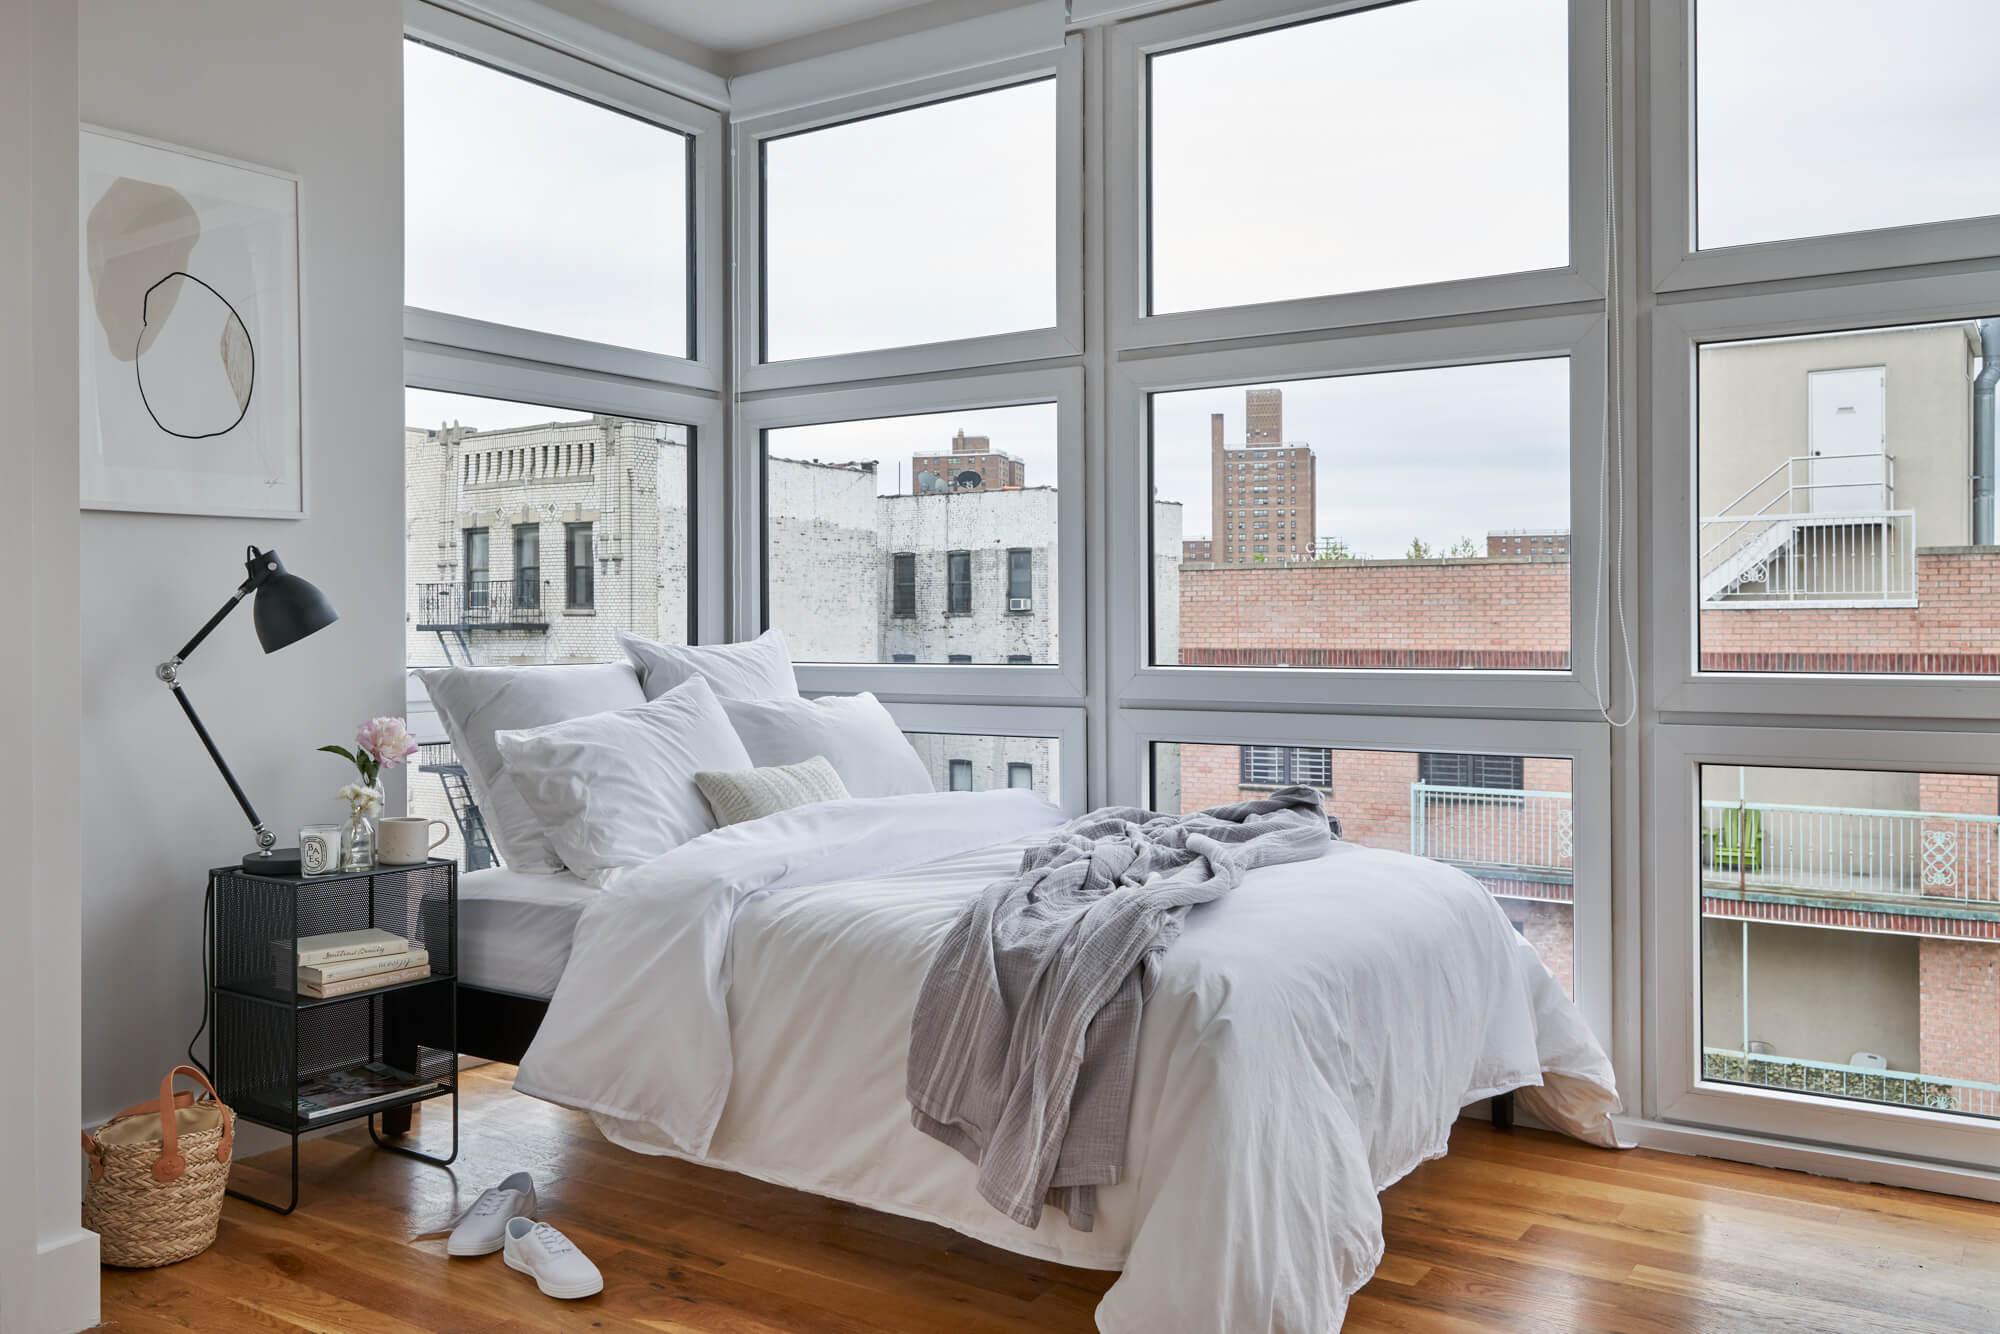 marcy bedroom